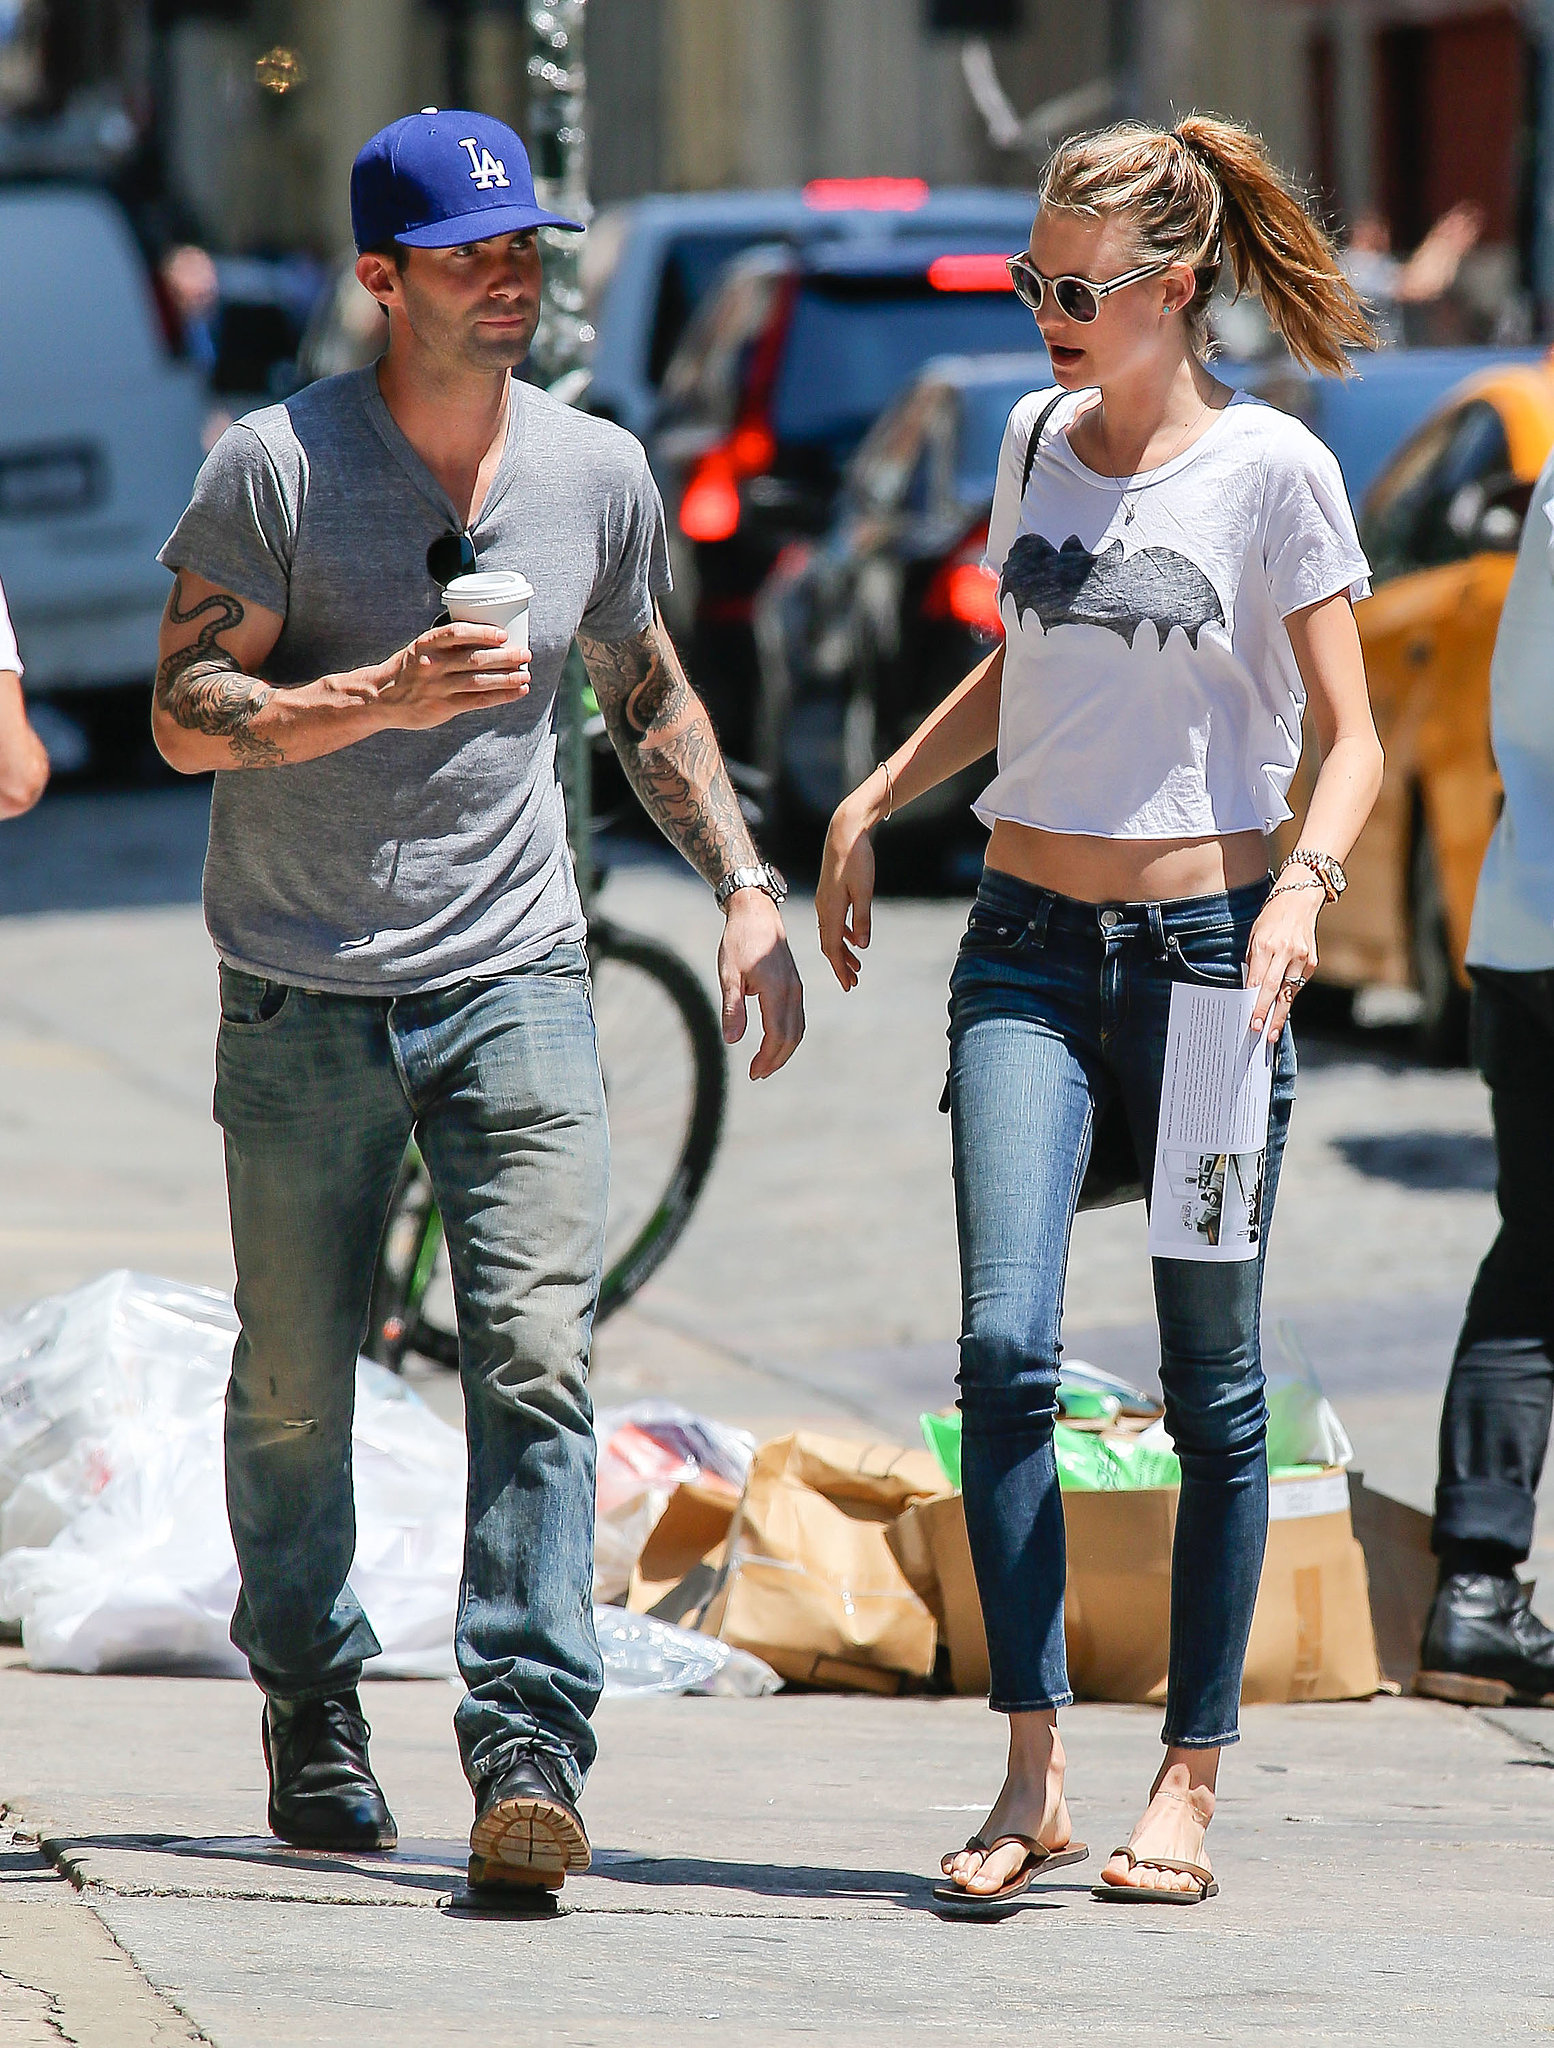 Behati Prinsloo and Adam Levine walked around NYC.